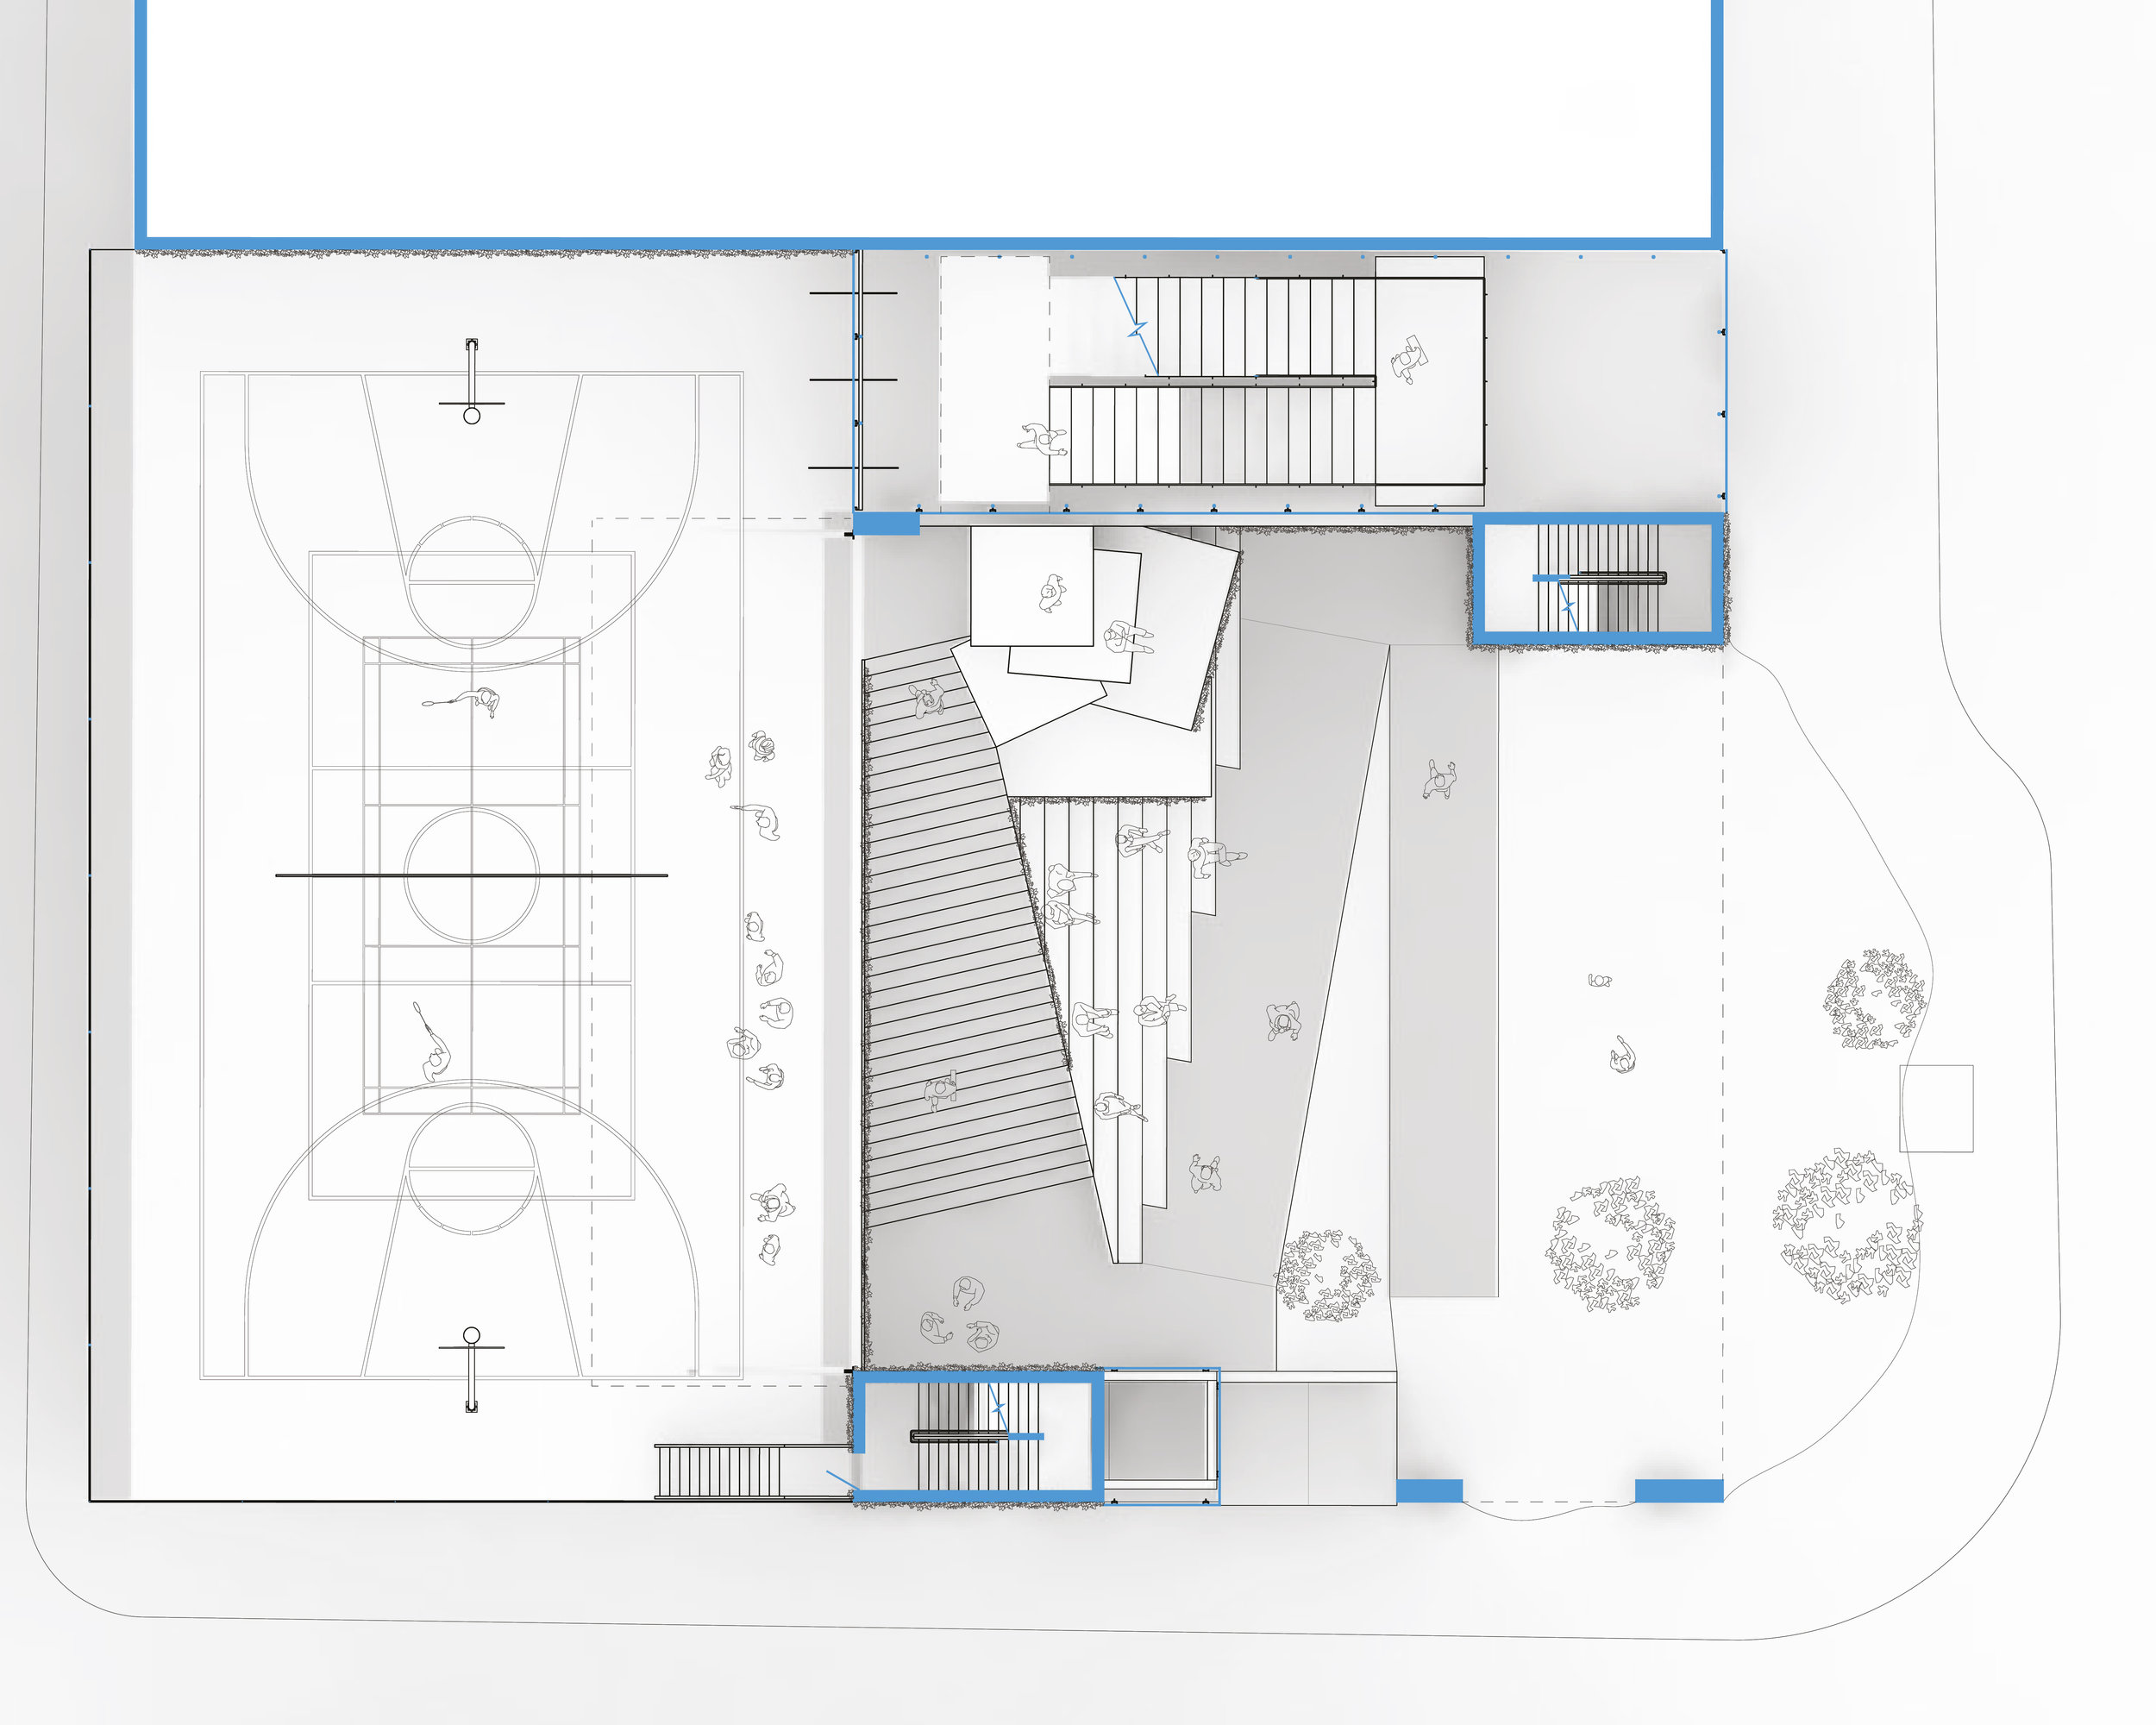 Plaza Level Plan